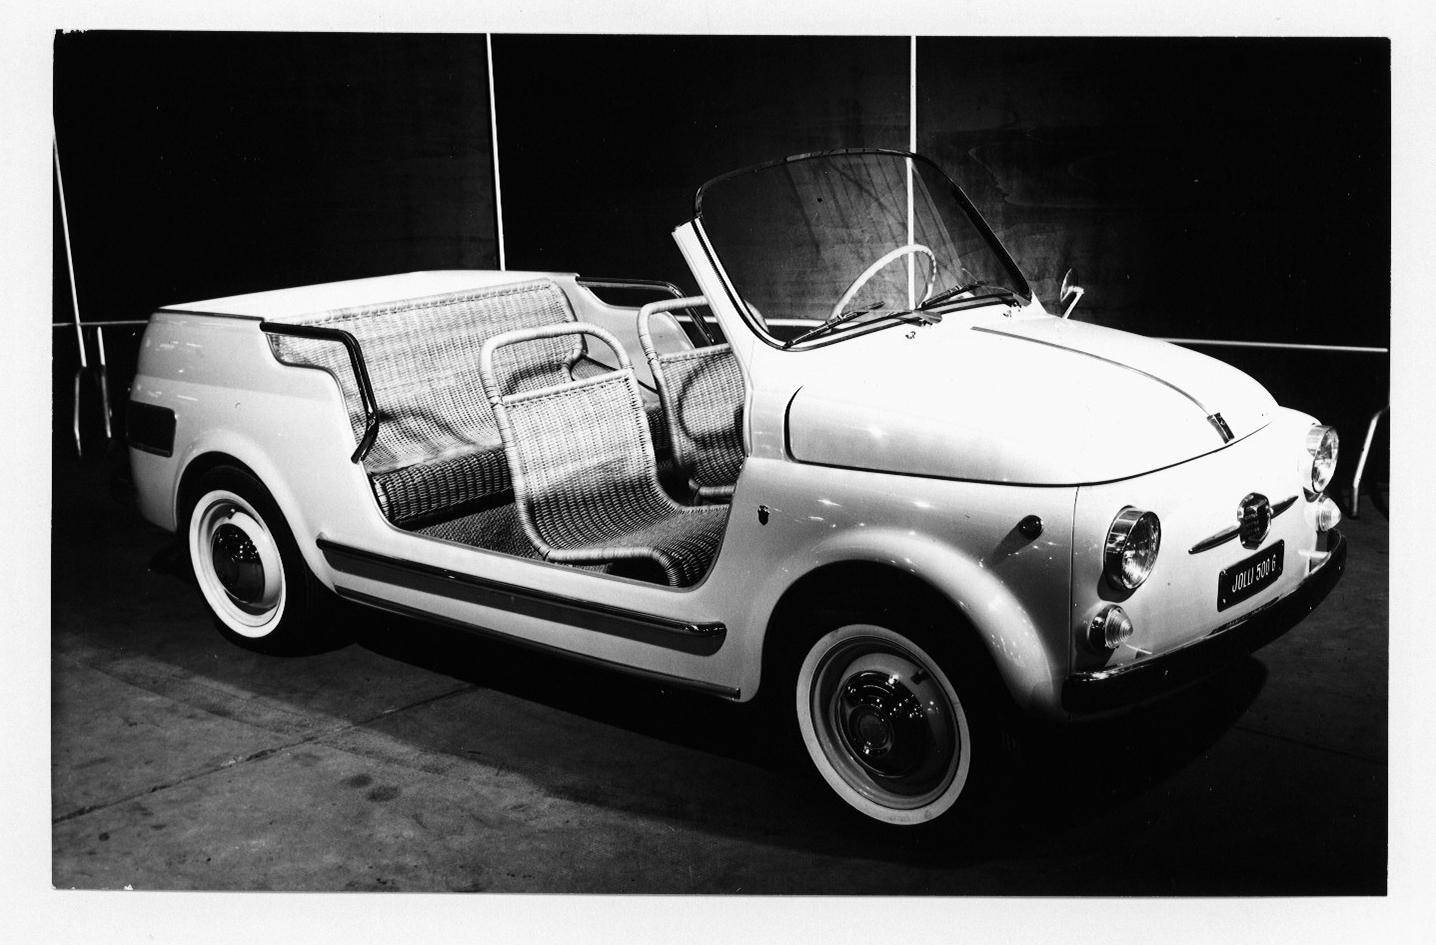 1957 Fiat Jolly Ghia Studios